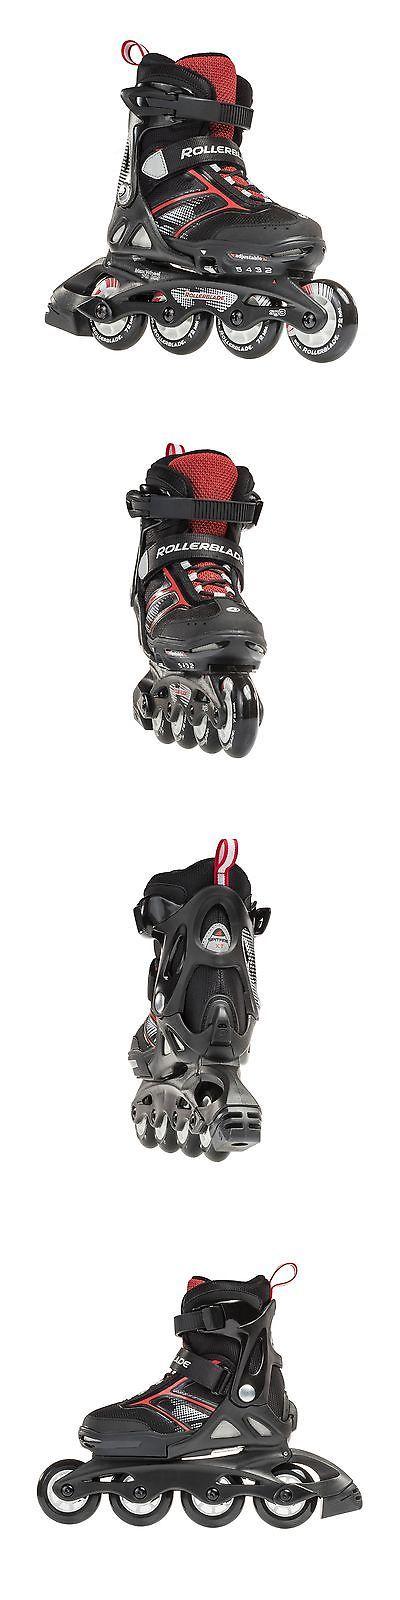 Youth 47345: Rollerblade Spitfire Jr Xt 2016 Kids Skate Black Red Adjustable (5 To 8) -> BUY IT NOW ONLY: $102 on eBay!